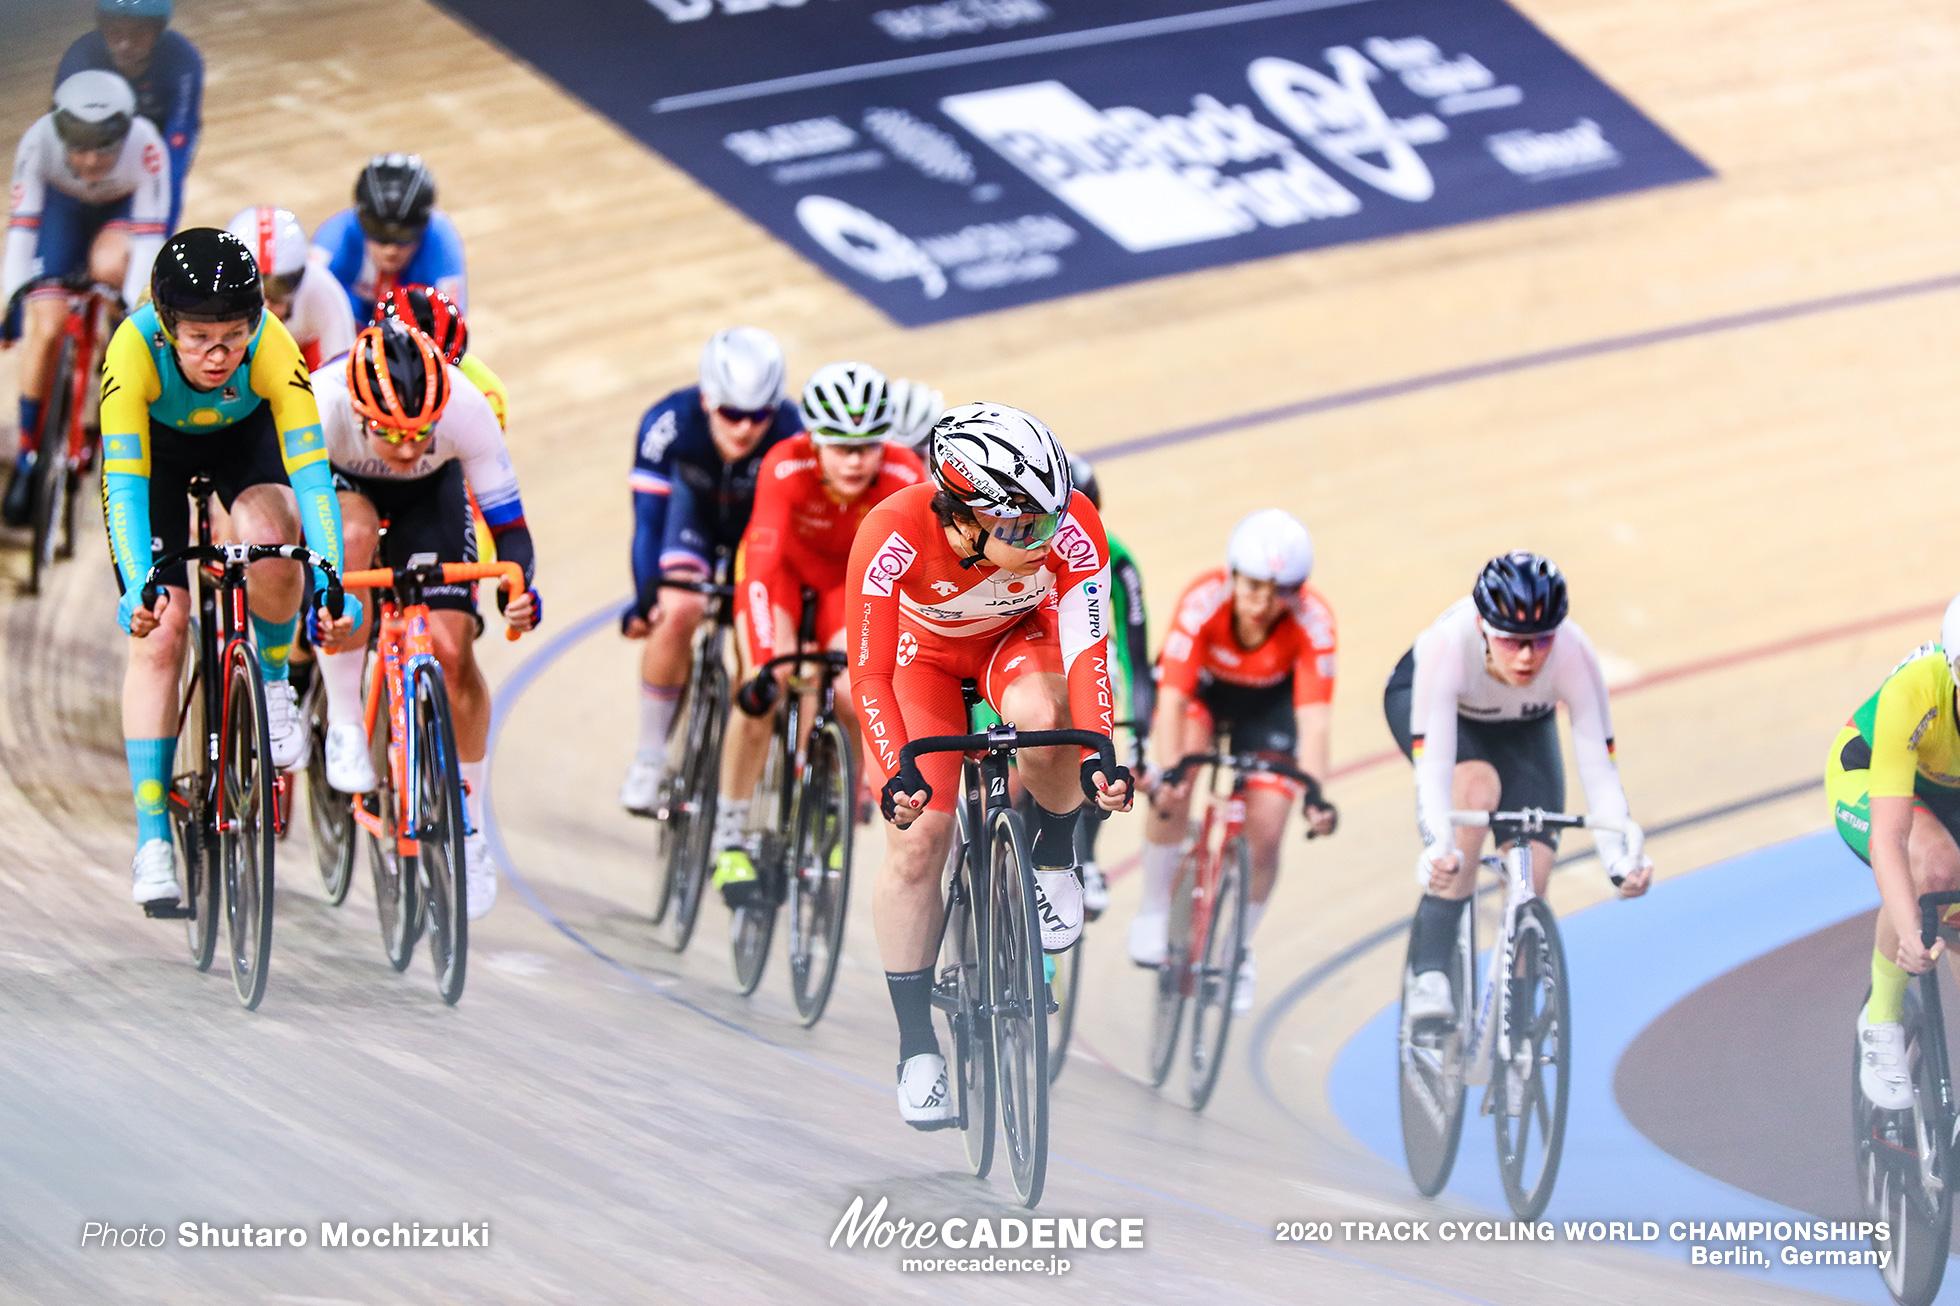 Women's Scratch / 2020 Track Cycling World Championships, 古山稀絵 Furuyama Kie, リナタ・スルタノバ Rinata Sultanova